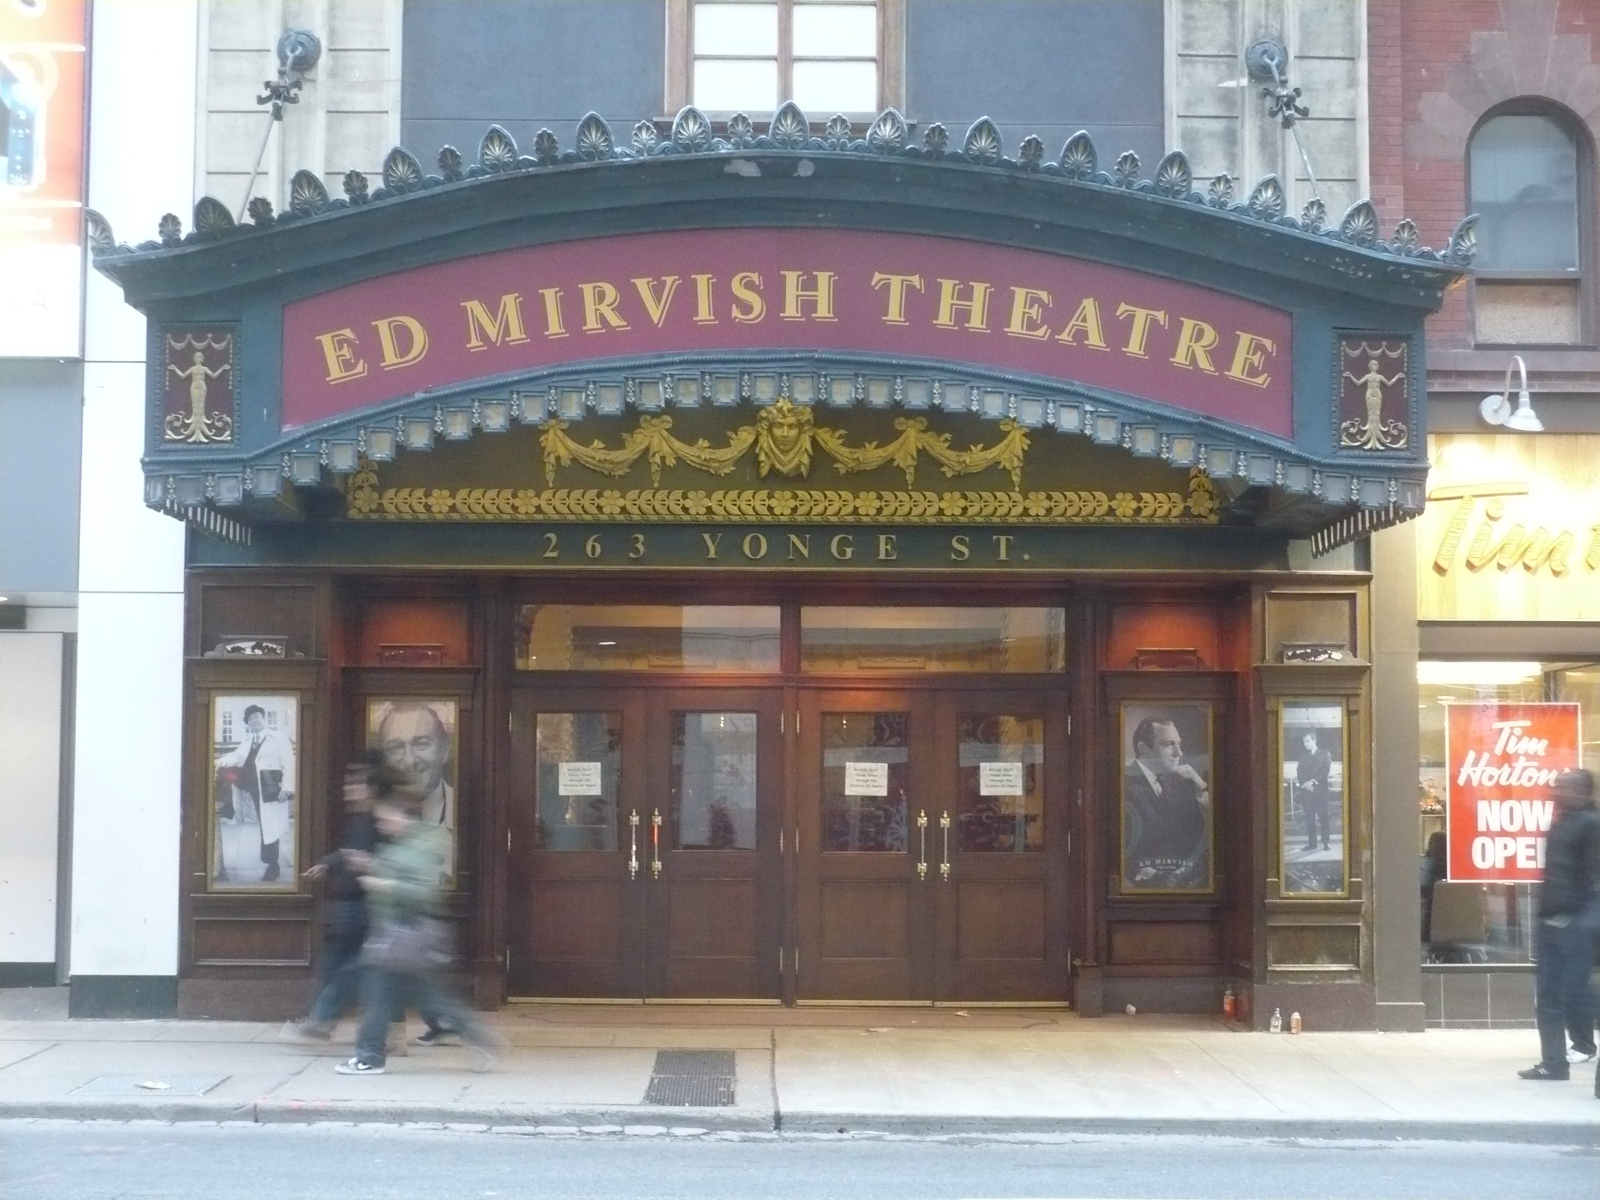 Ed Mirvish Theatre Parking And Restaurants